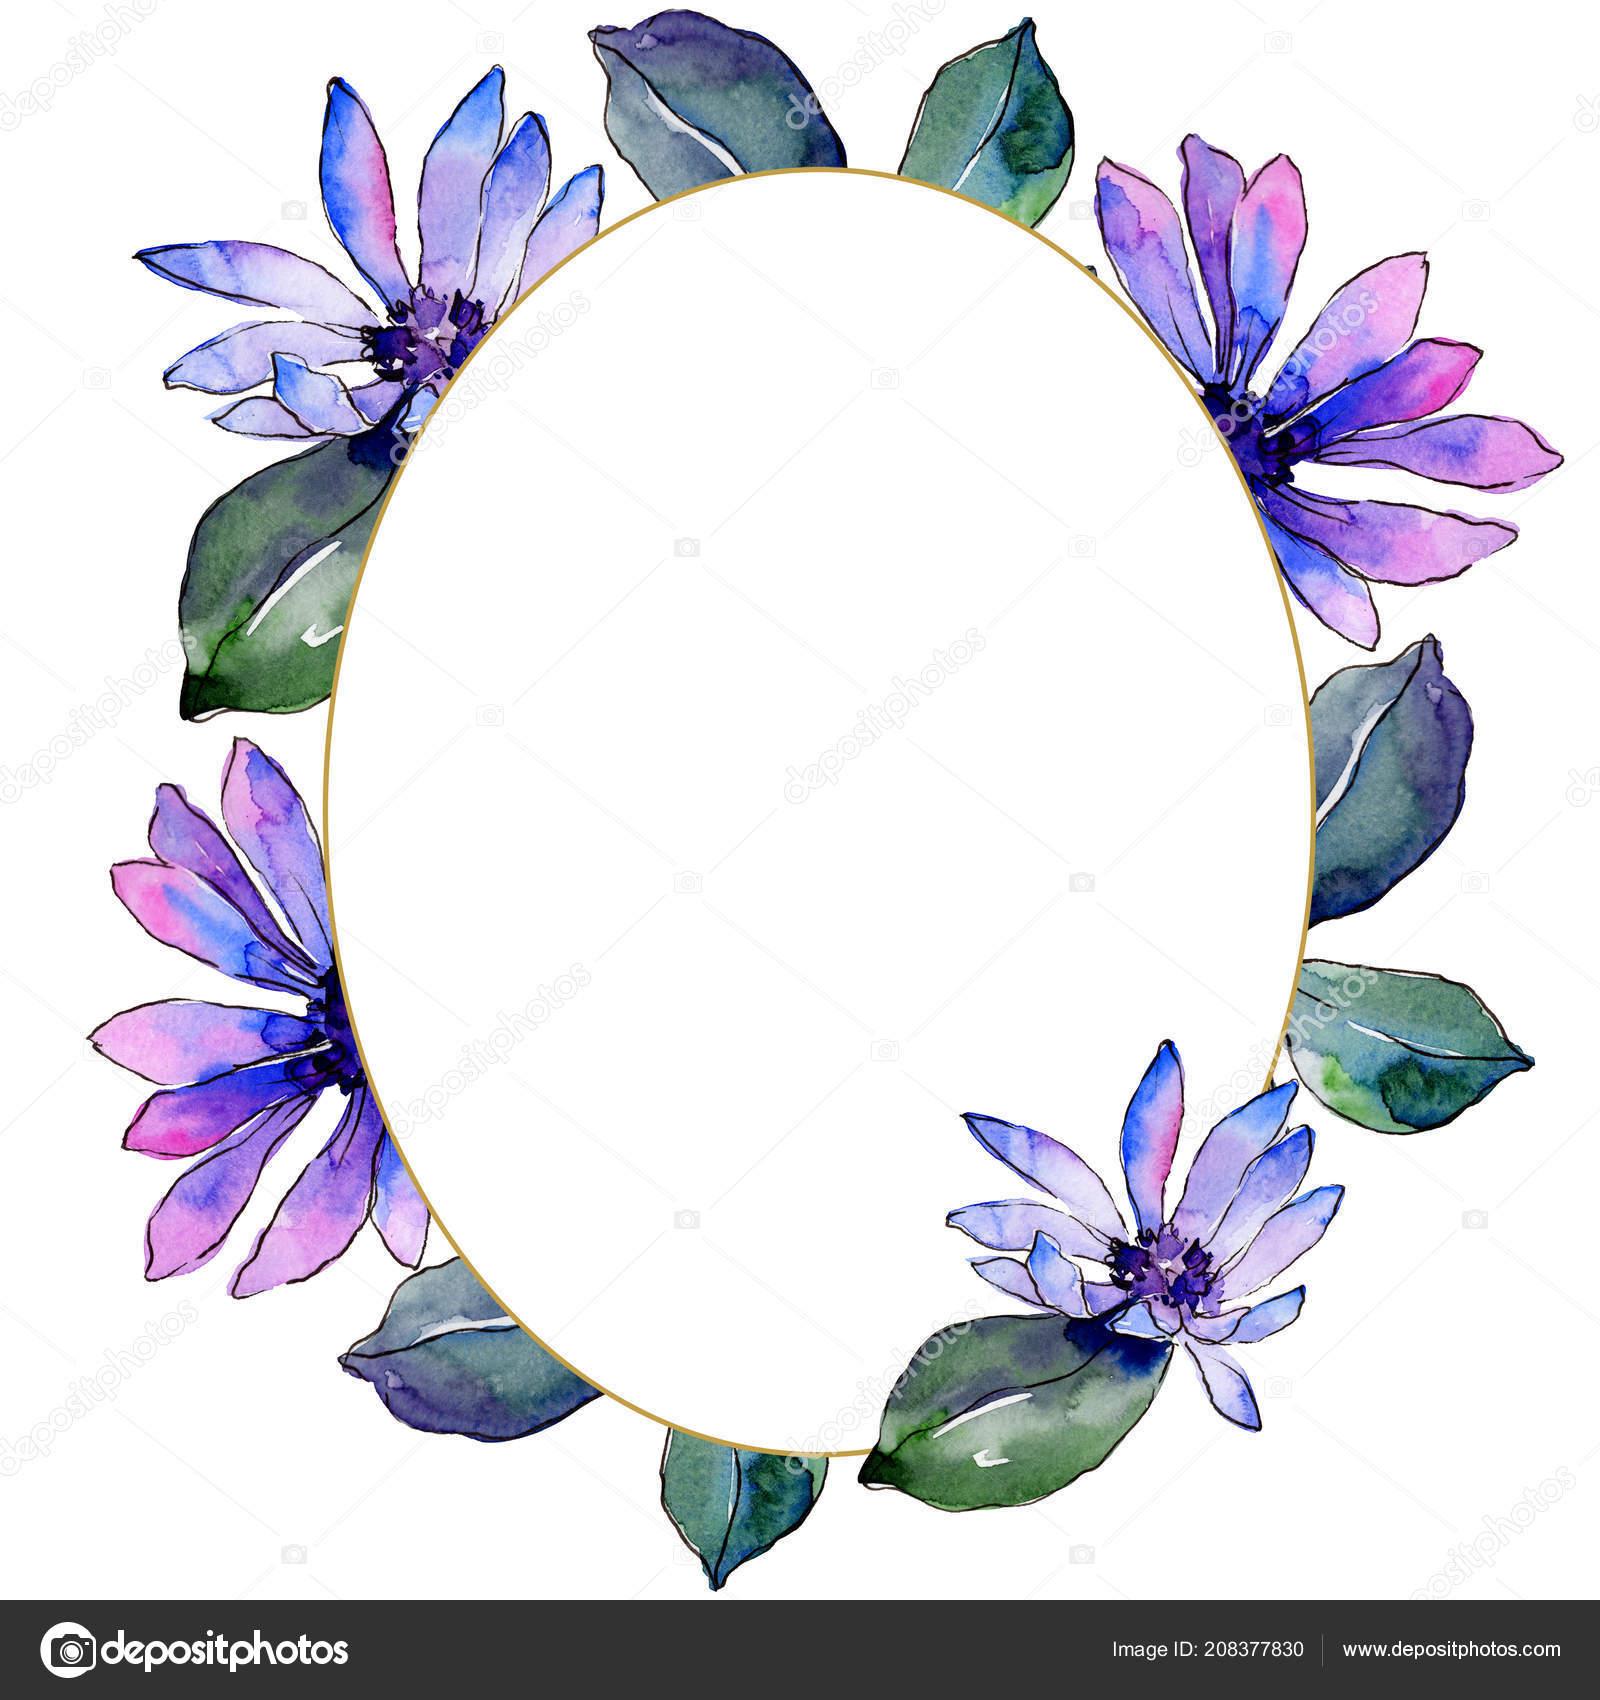 Watercolor purple african daisy floral botanical flower frame border watercolor purple african daisy floral botanical flower frame border ornament stock photo izmirmasajfo